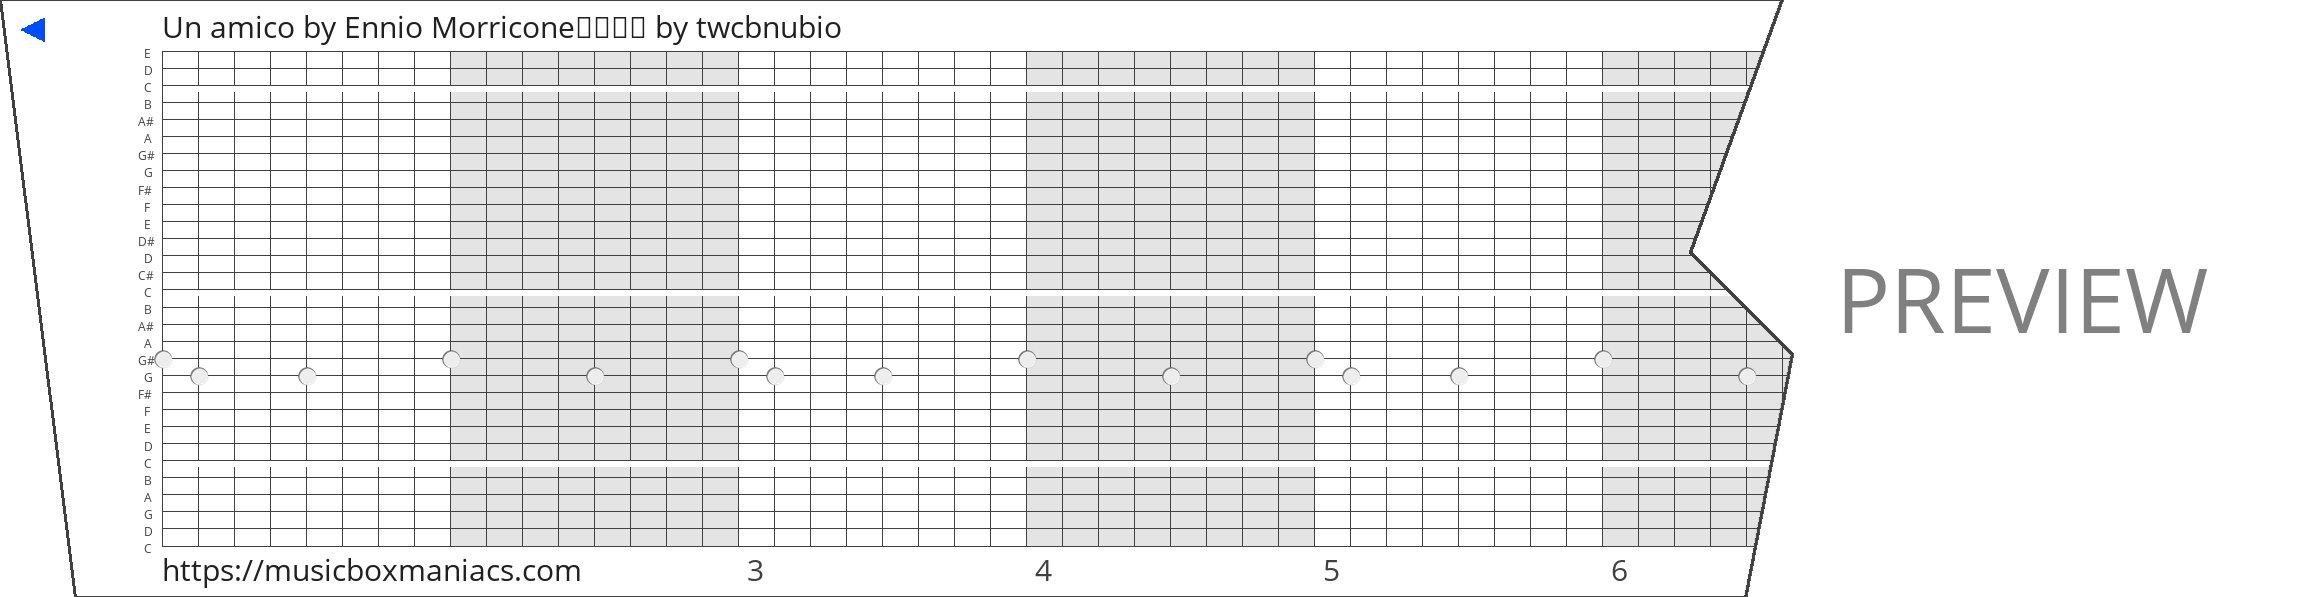 Un amico by Ennio Morricone三十音谱 30 note music box paper strip